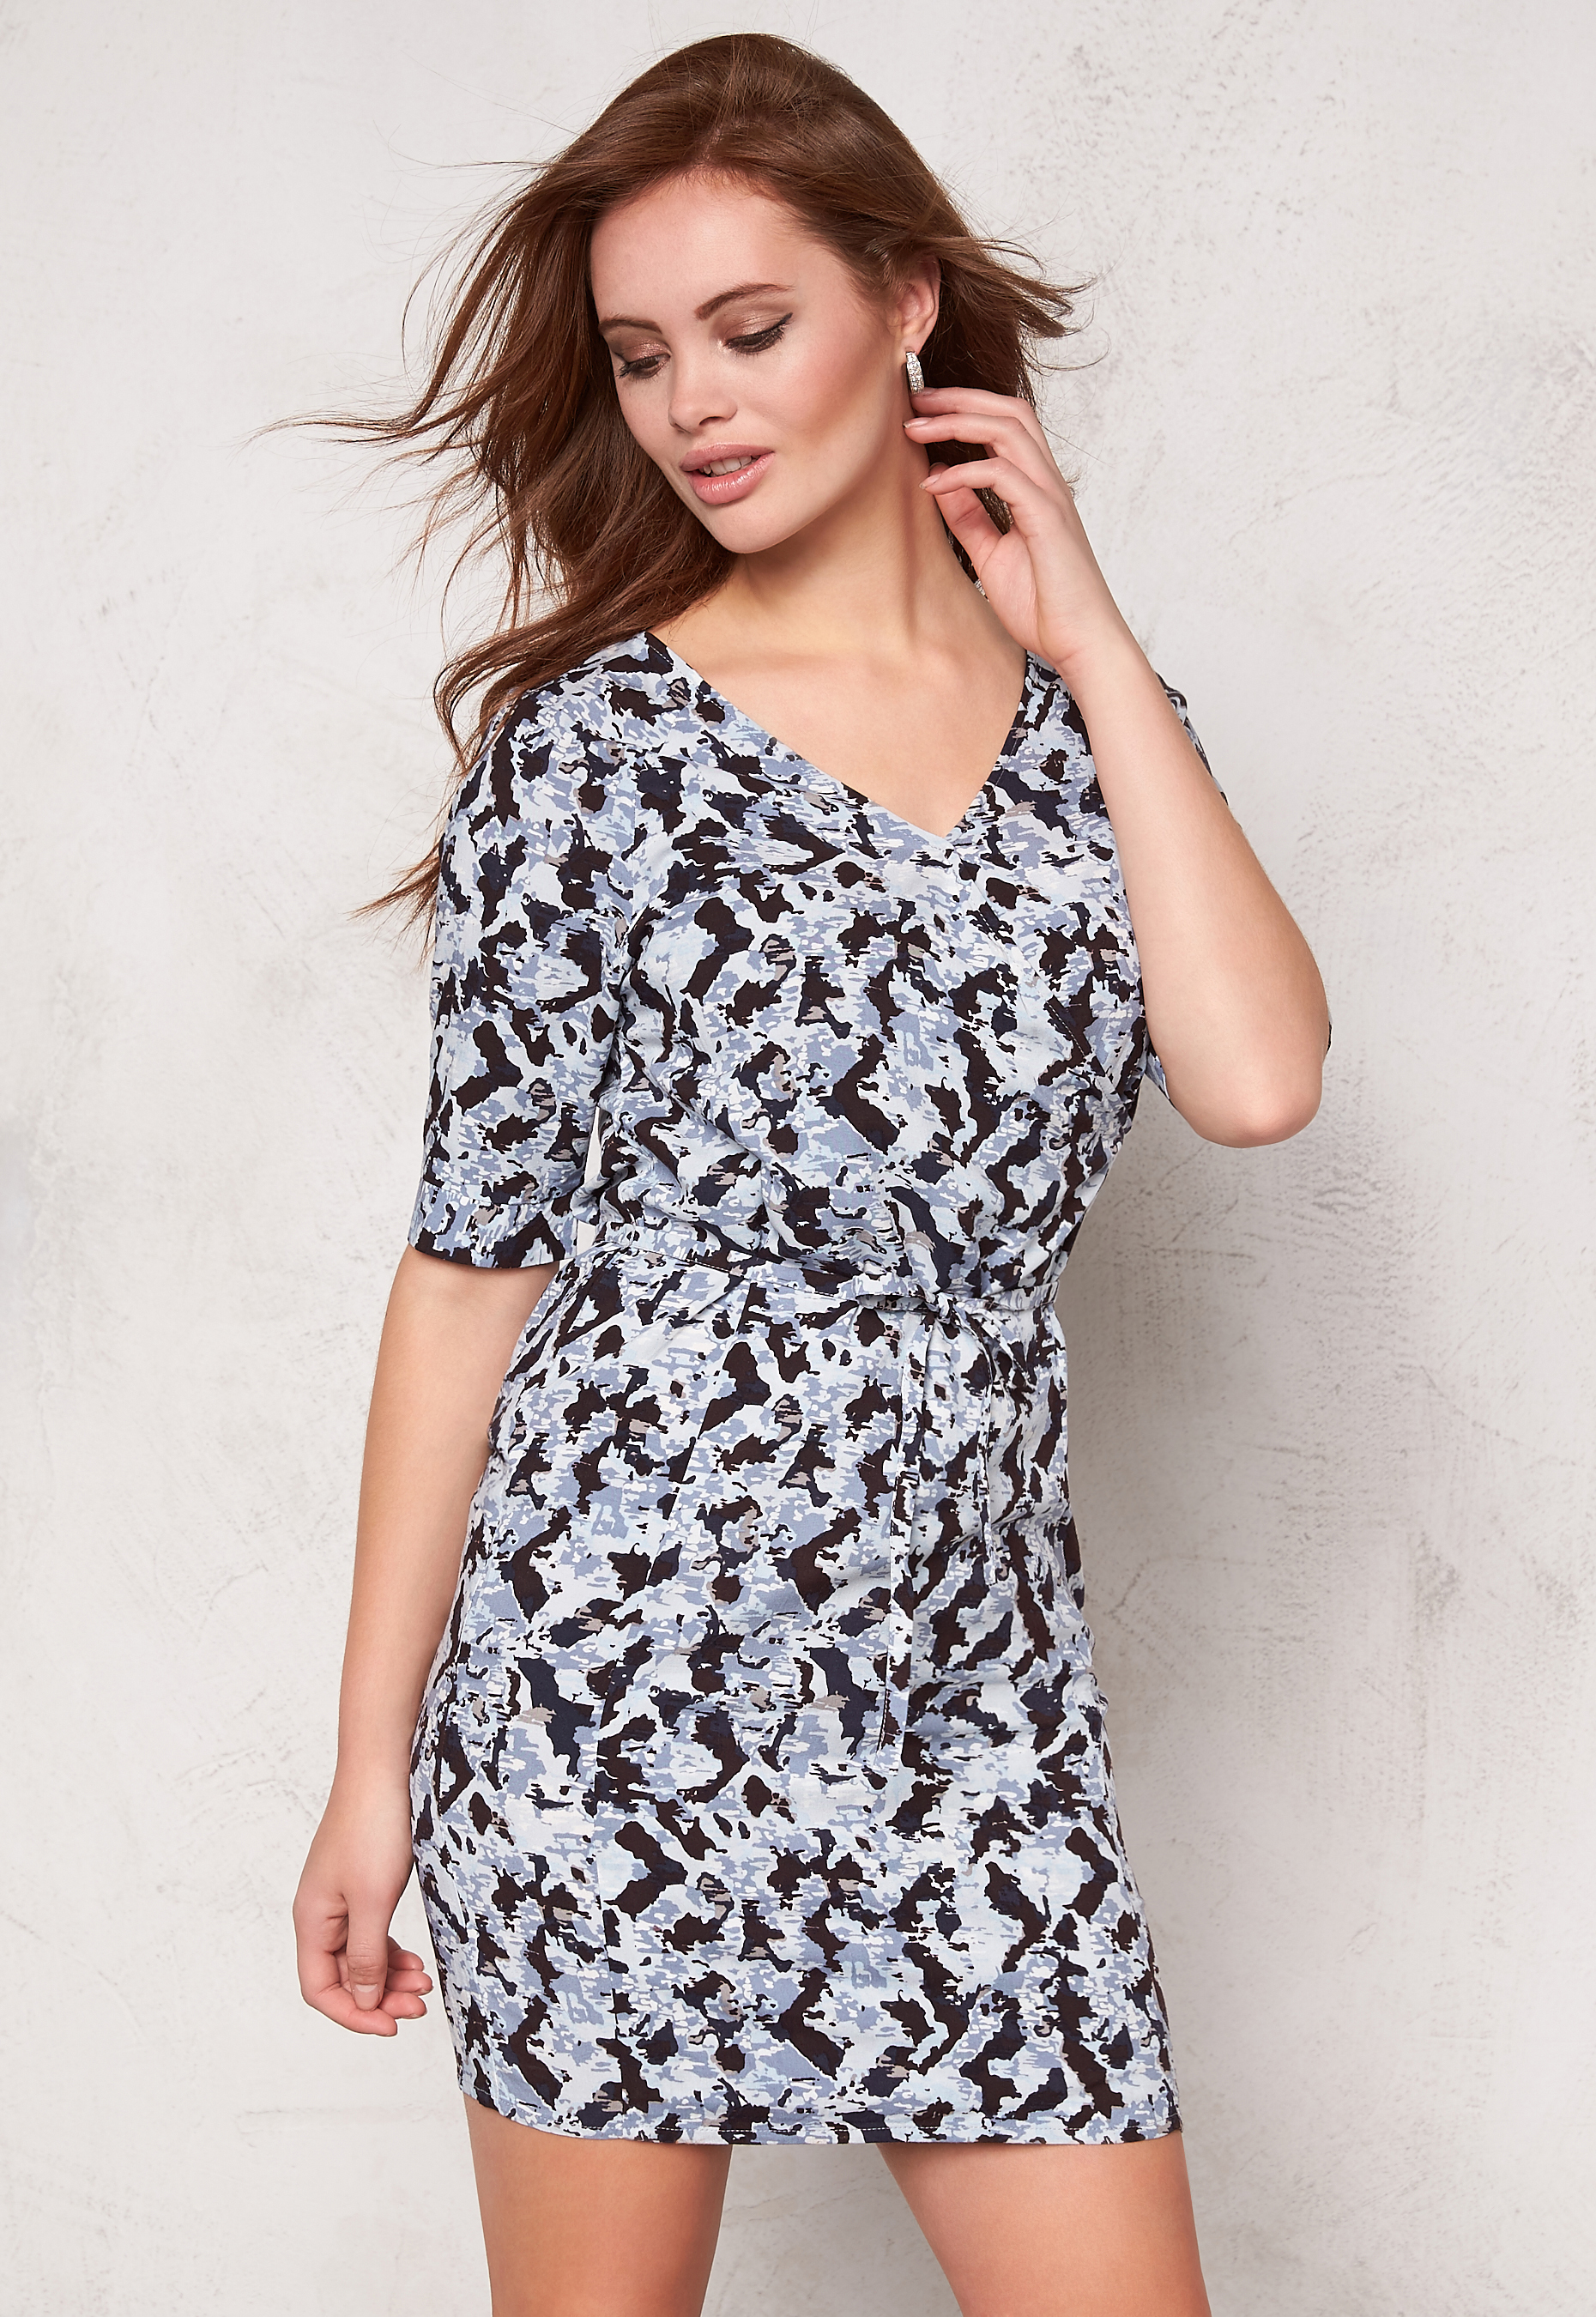 Cashmere 14010 Dress Eva Ichi Blue Bubbleroom zqg18p